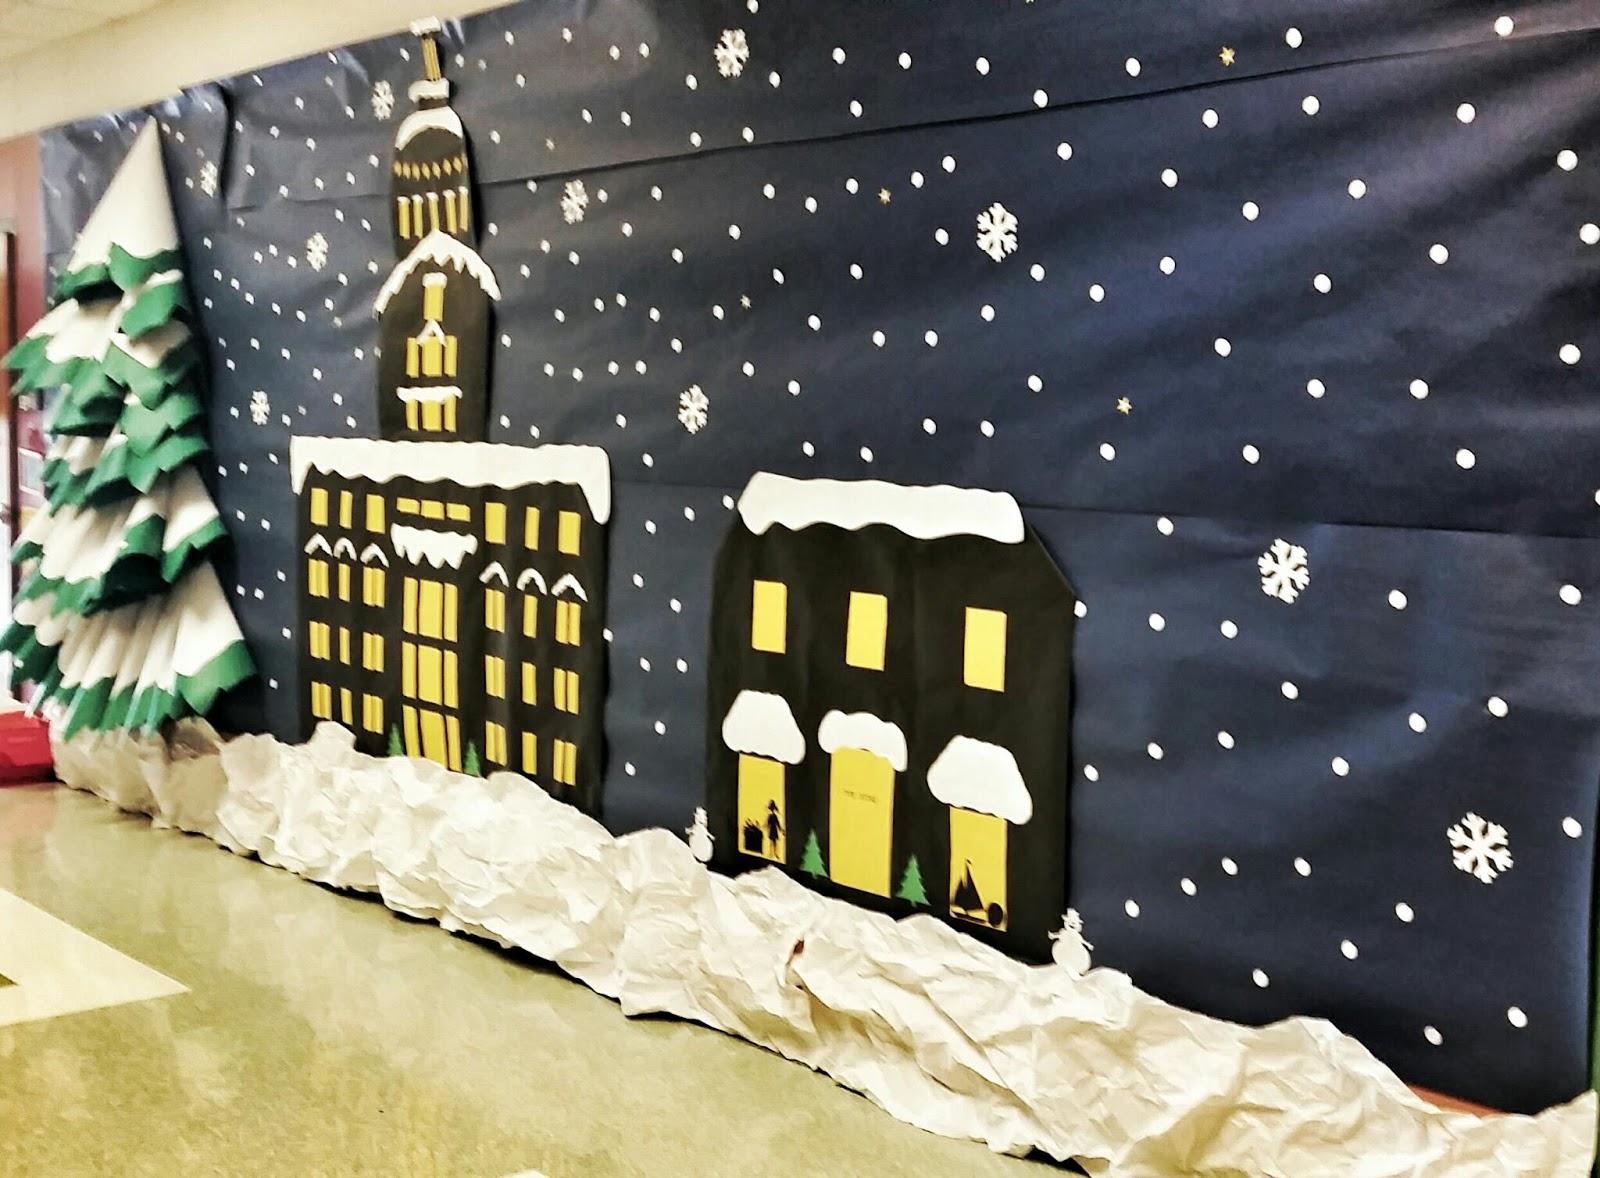 1st Grade Christmas Party Ideas Part - 45: 1st Grade Christmas Party Ideas